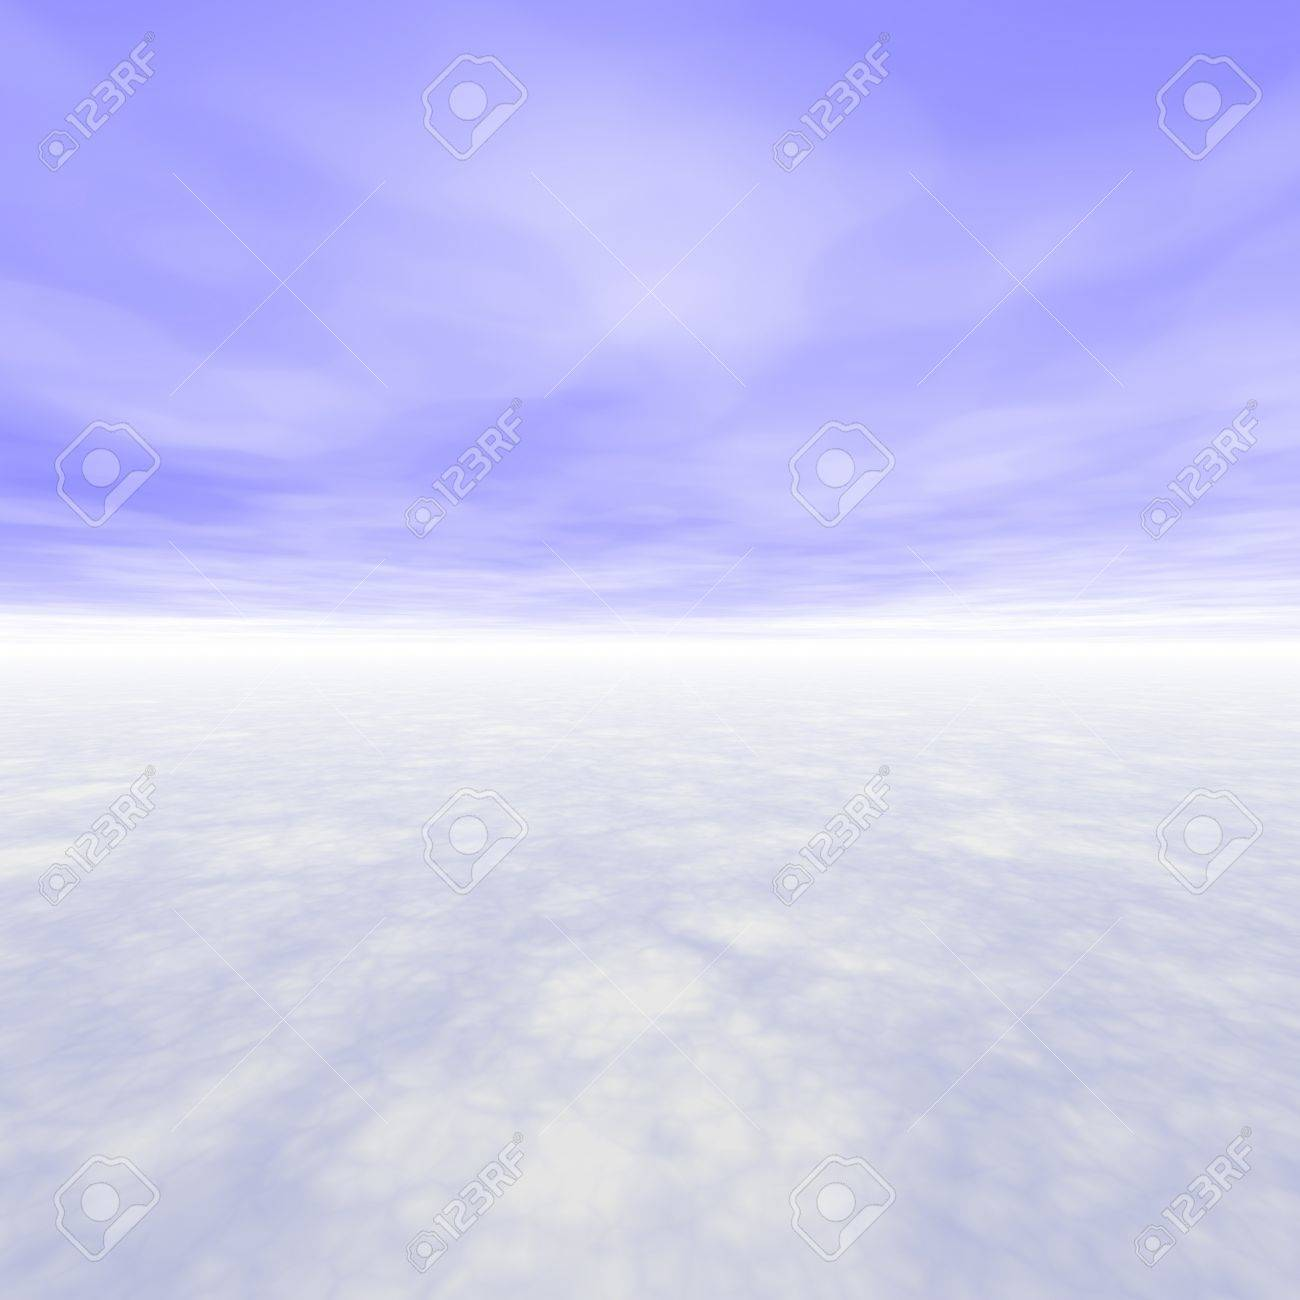 No Boundaries Scenery With Light Blue Skies Stock Photo - 4457749